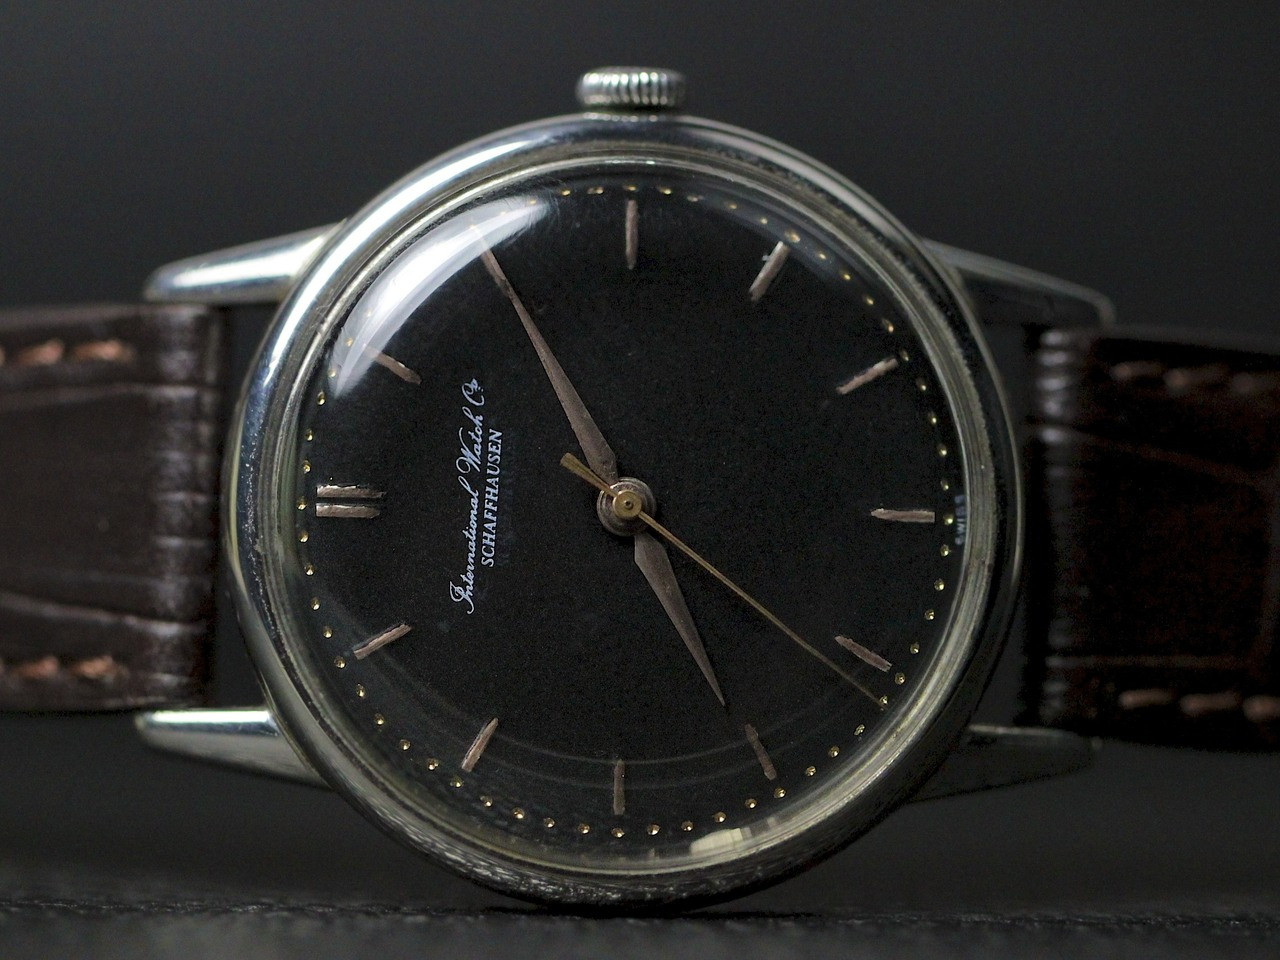 Dial Close-up - Vintage IWC watch - Vintage Black Dial  - www.Legendoftime.com - Chicago Watch Center